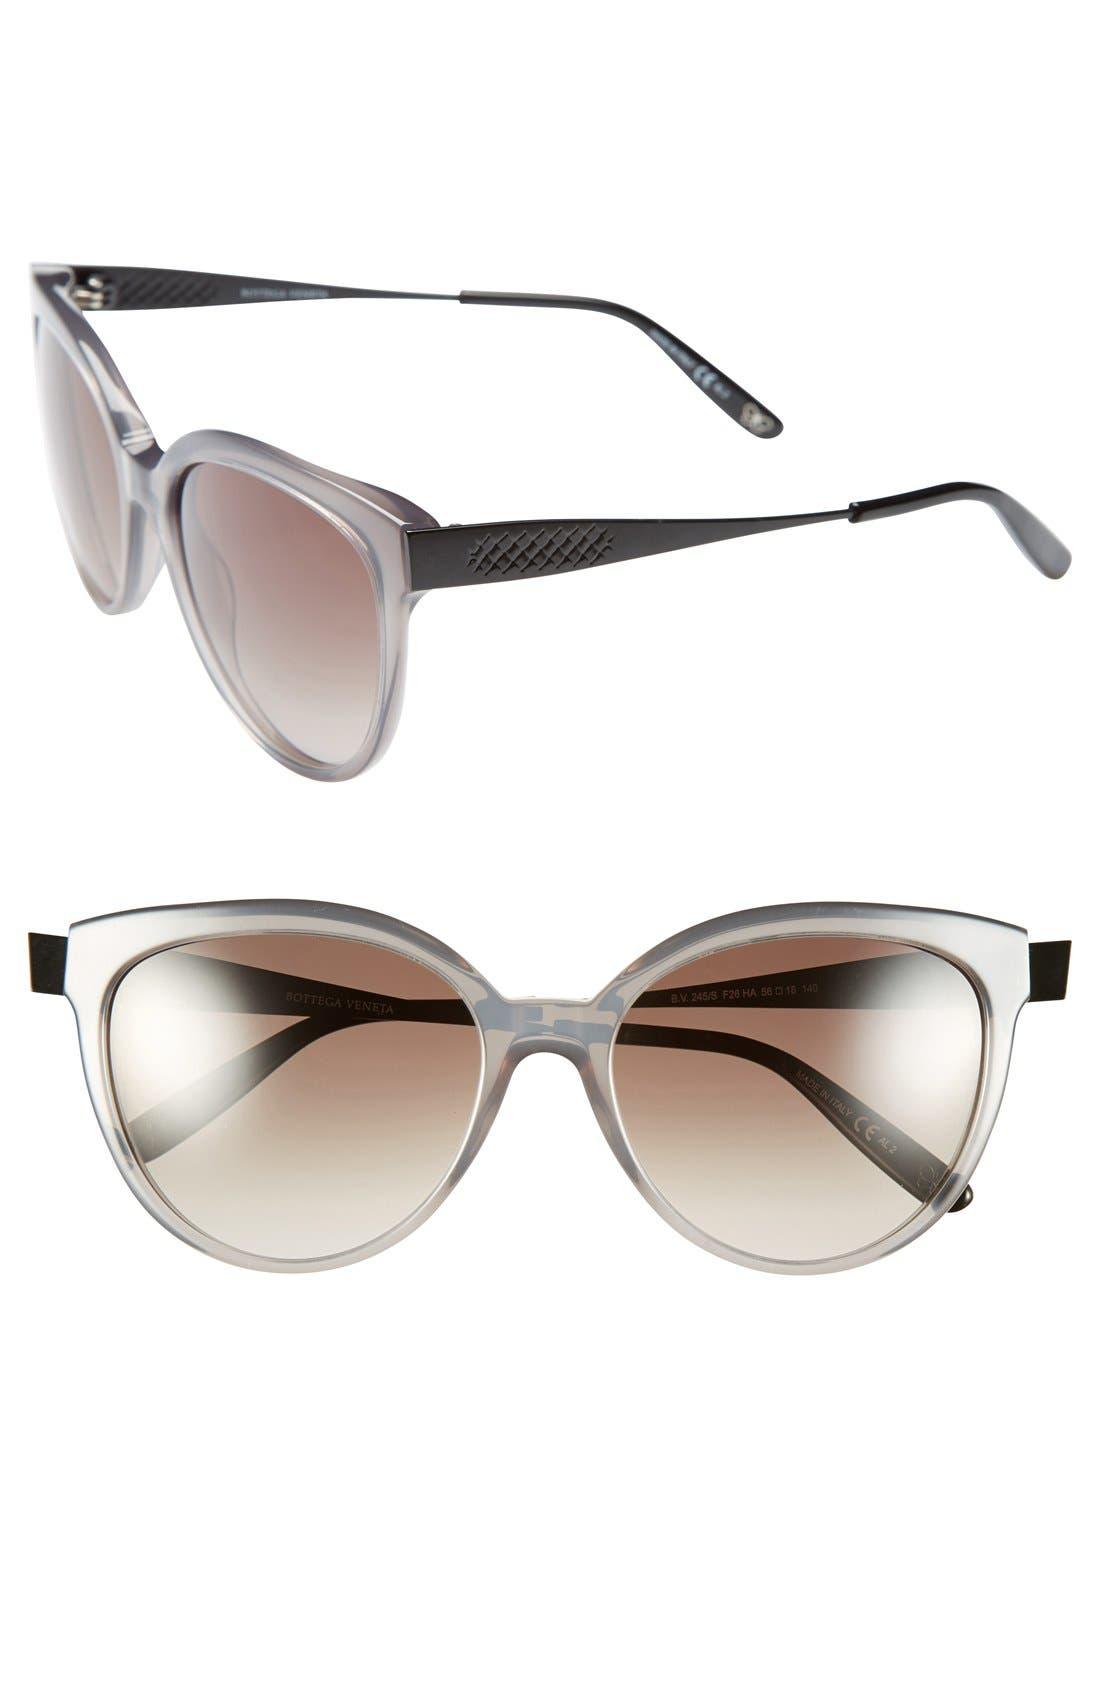 Alternate Image 1 Selected - Bottega Veneta 56mm Retro Sunglasses